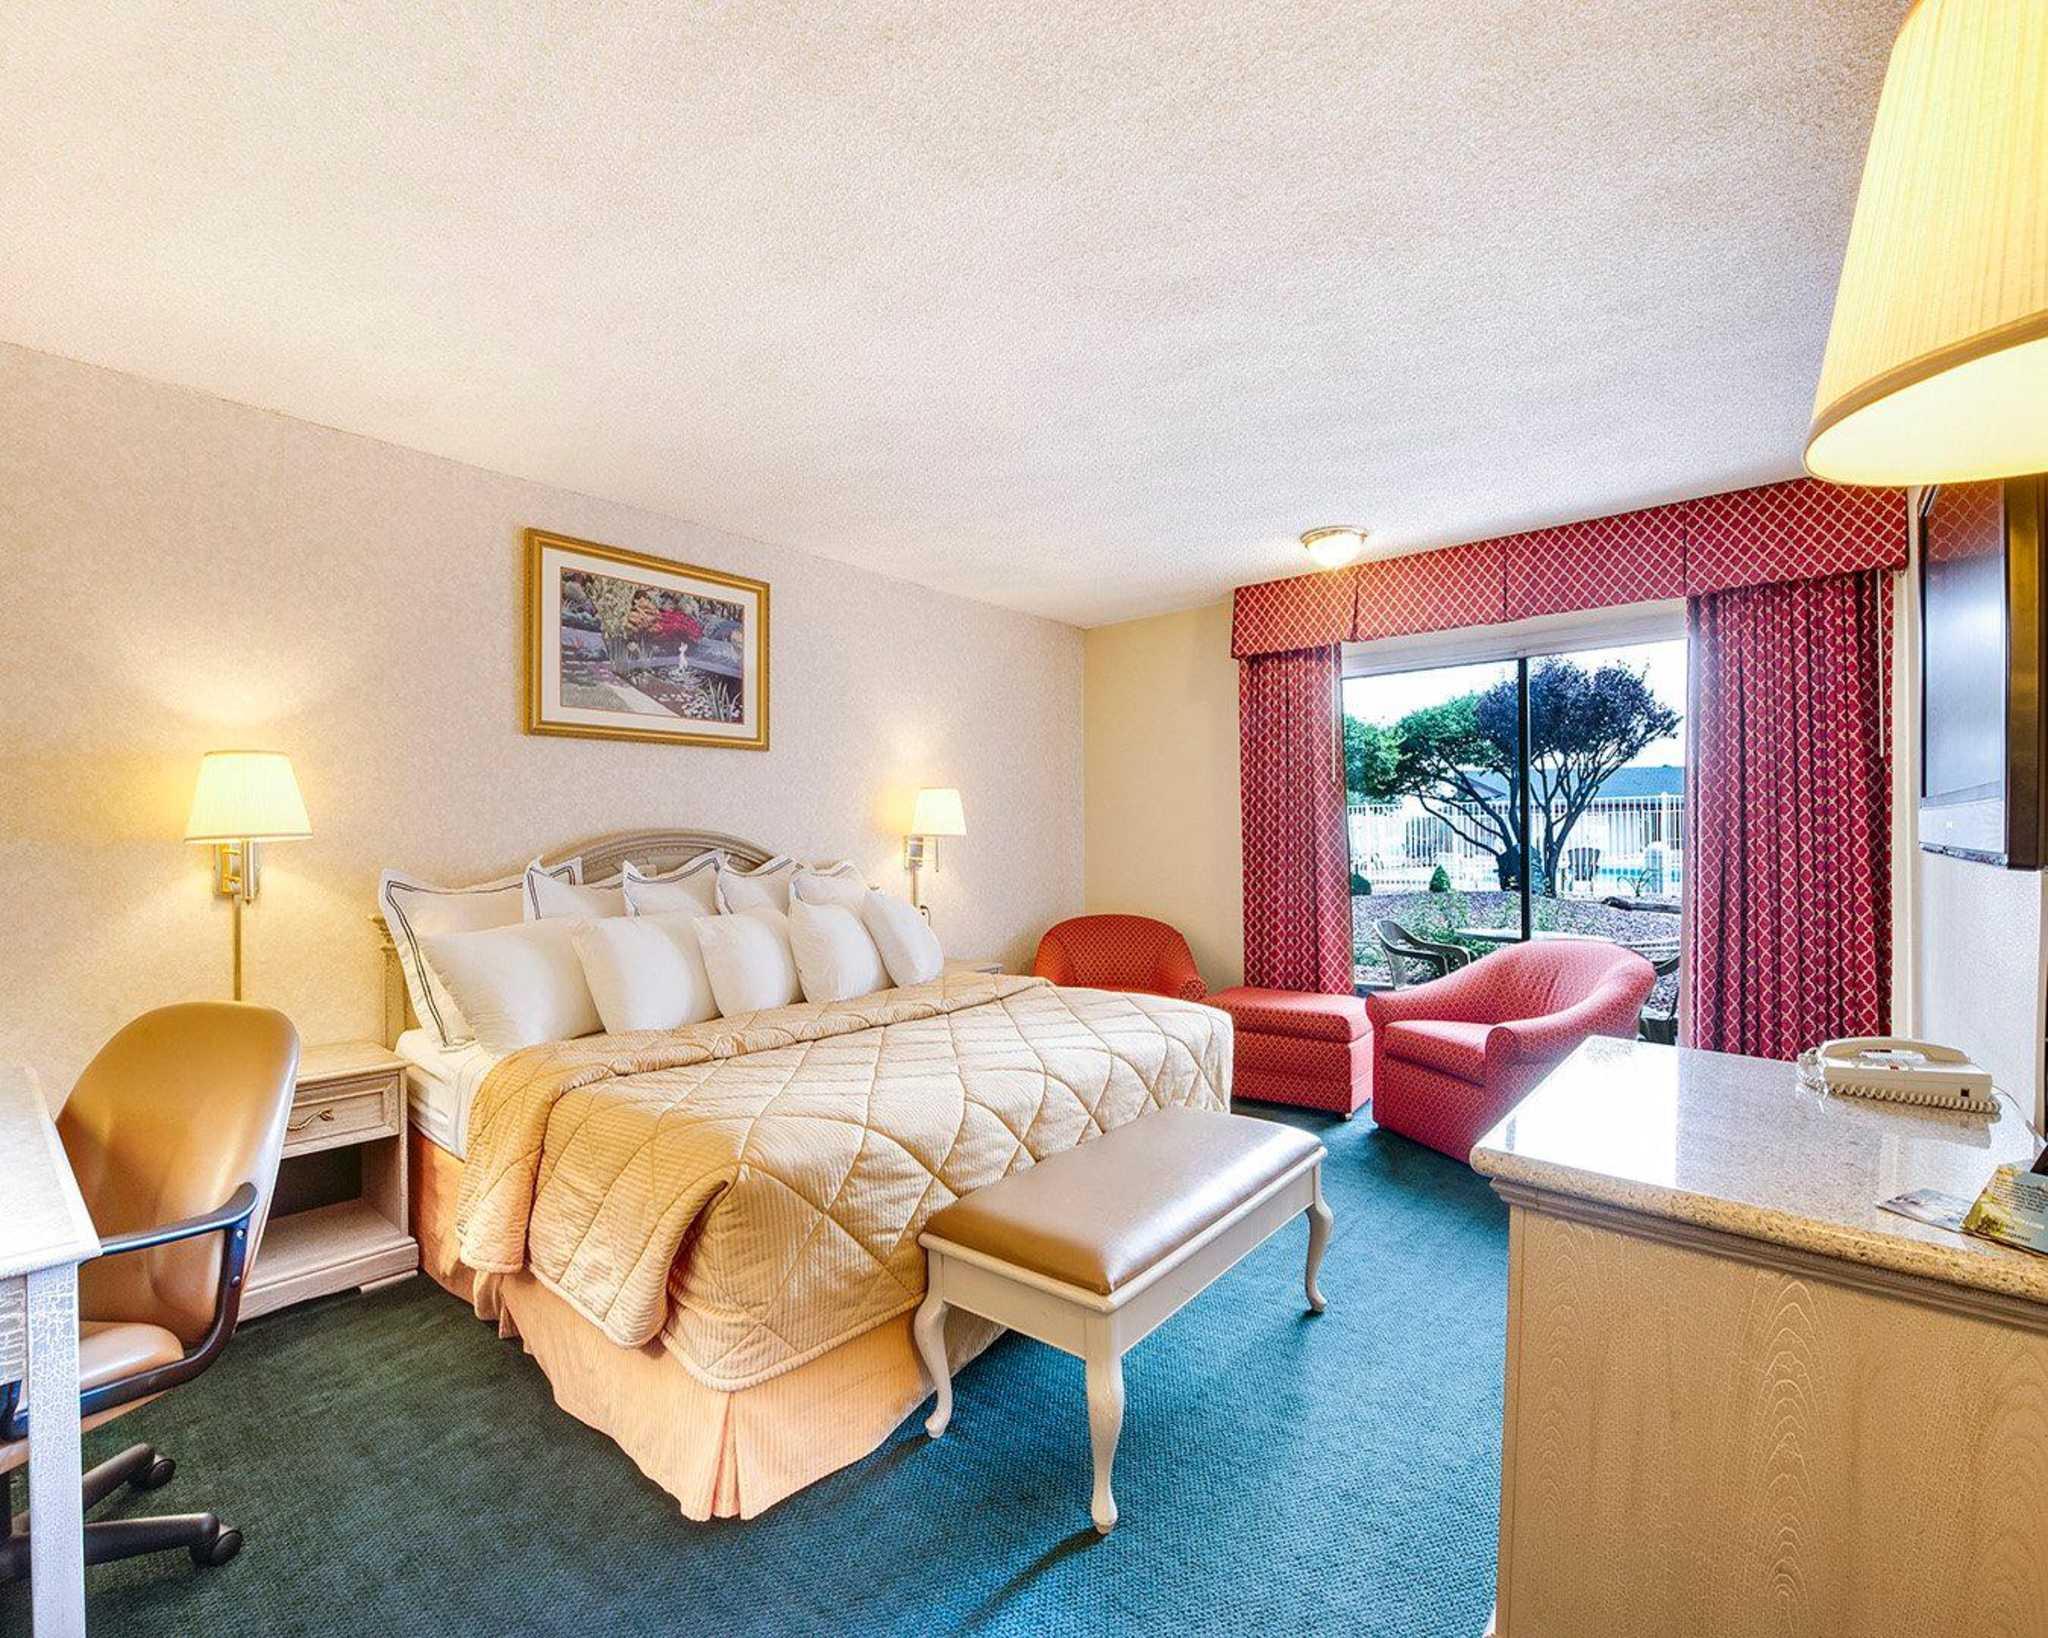 Hotels Near Flagstaff Az With Smoking Rooms